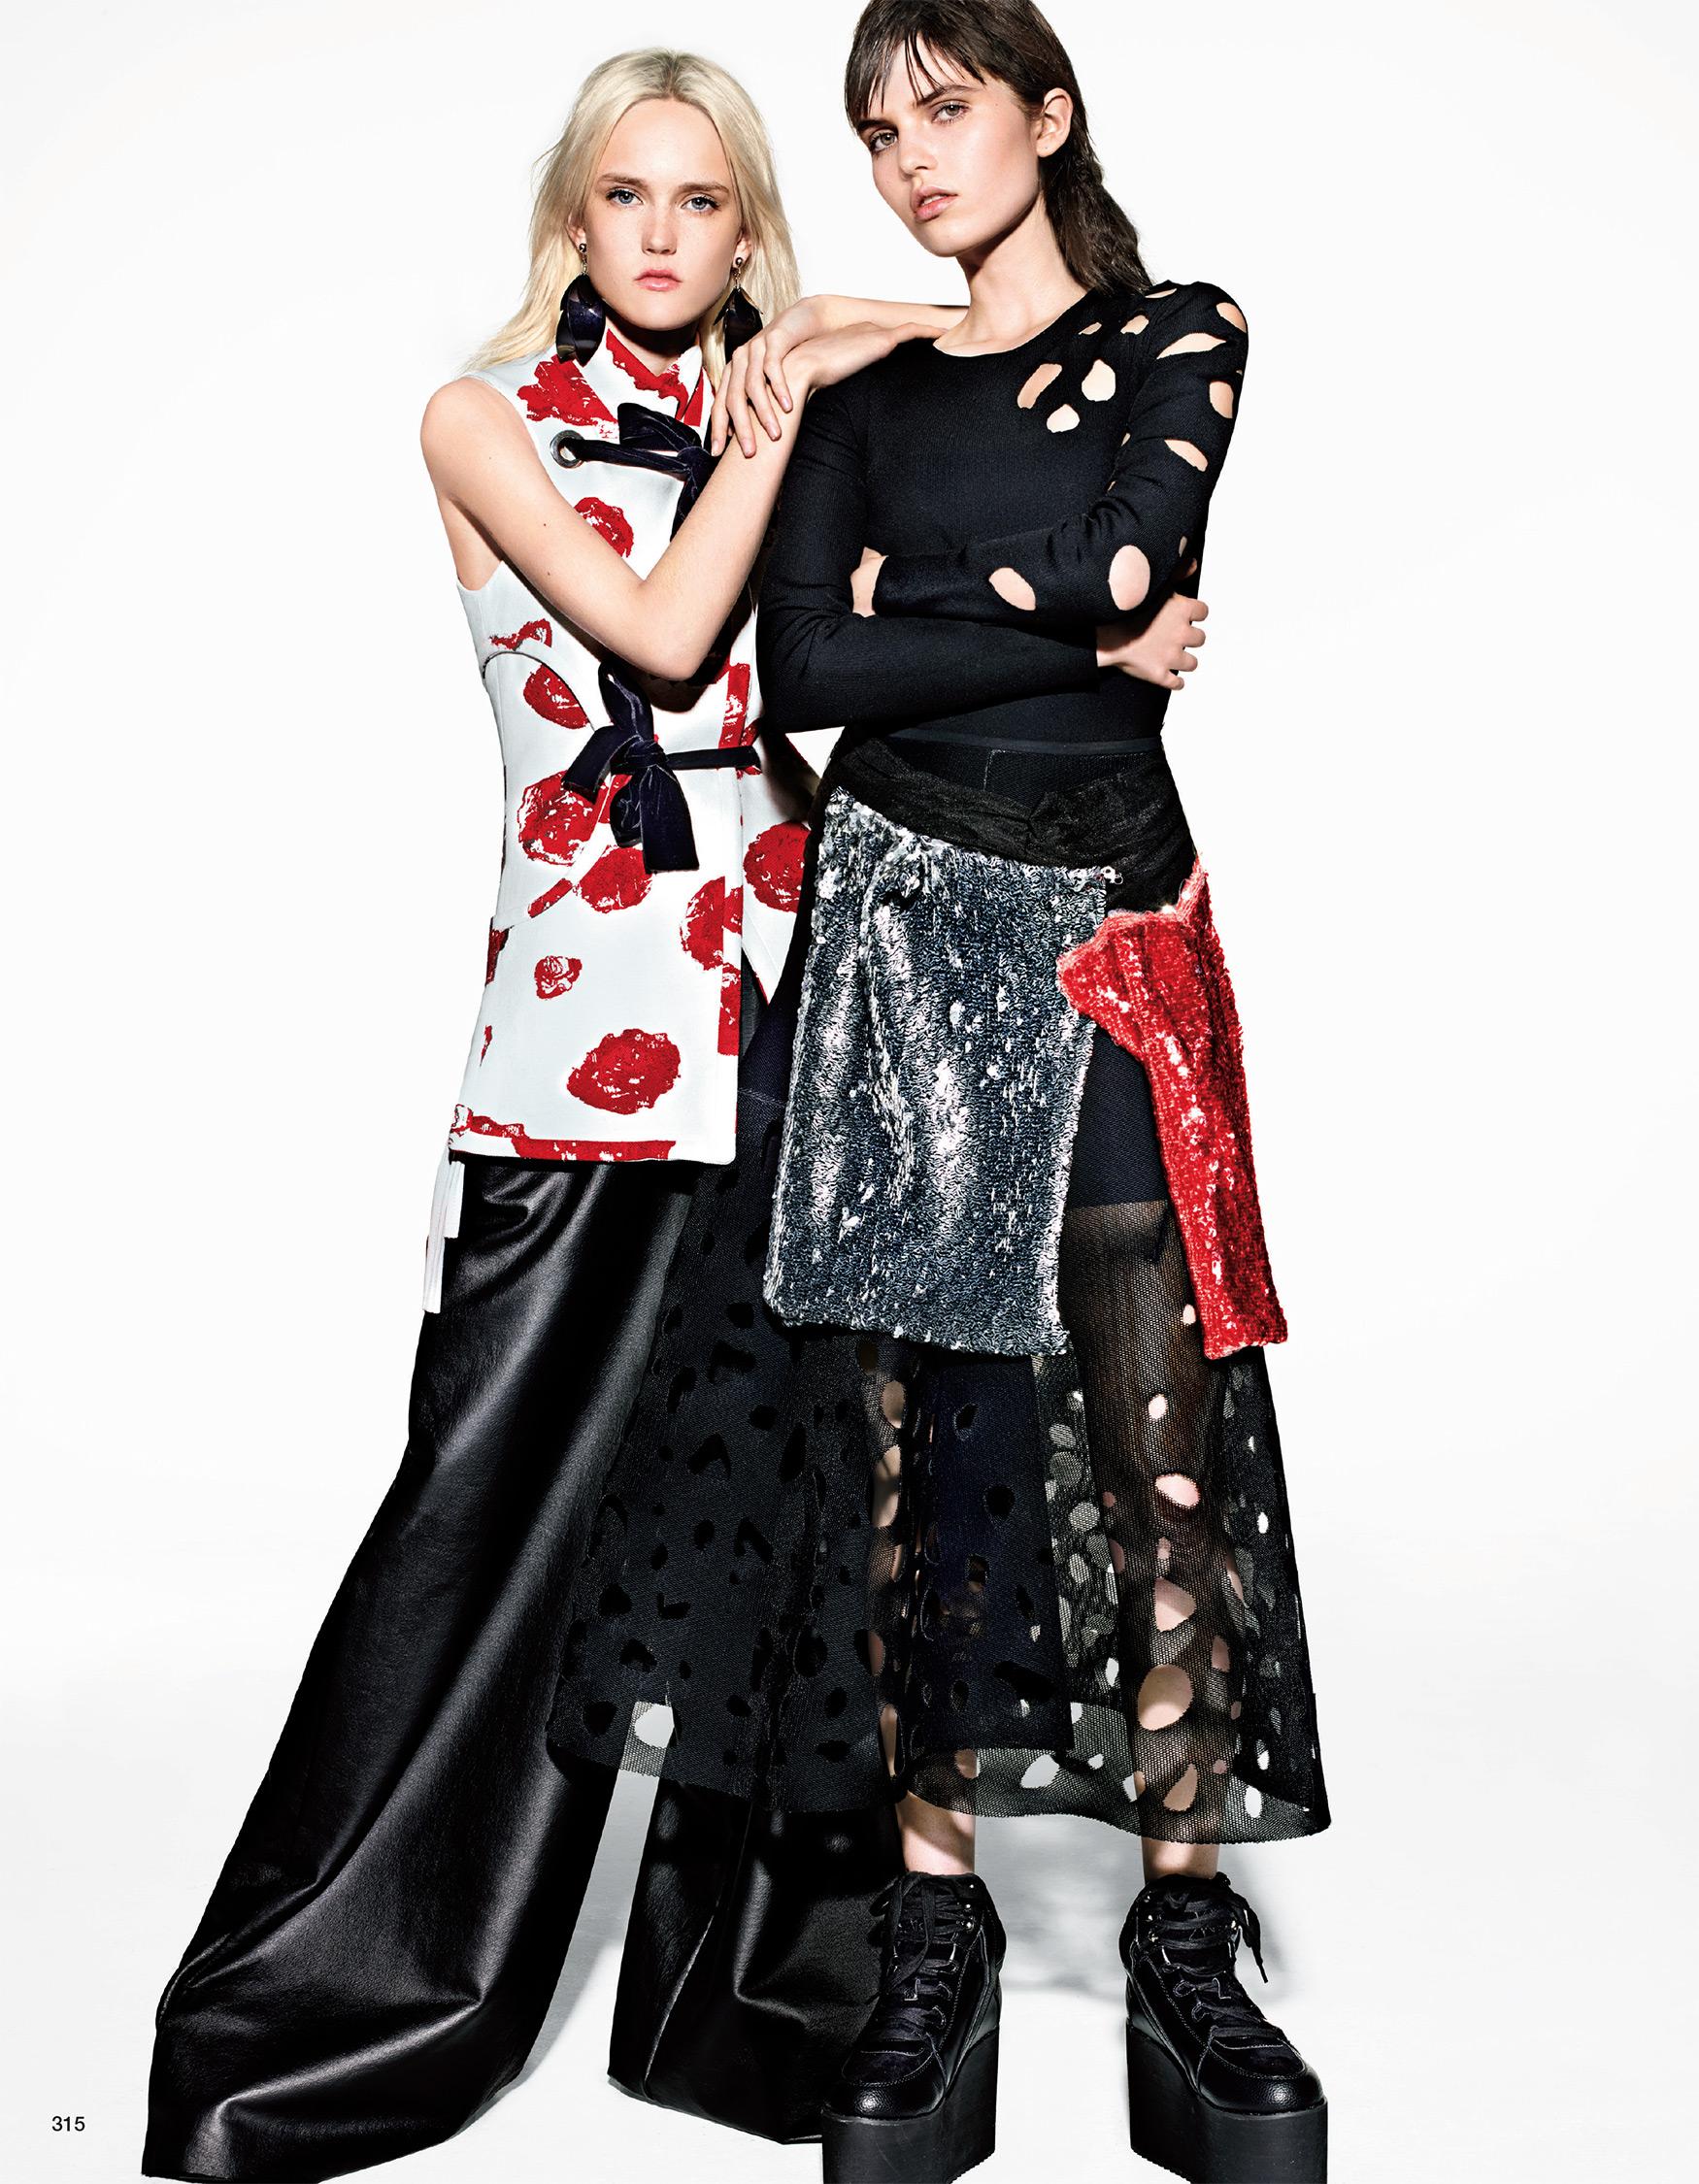 Giovanna-Battaglia-Vogue-Japan-The-Geek-Girls-Society-Richard-Brubridge-9.jpg